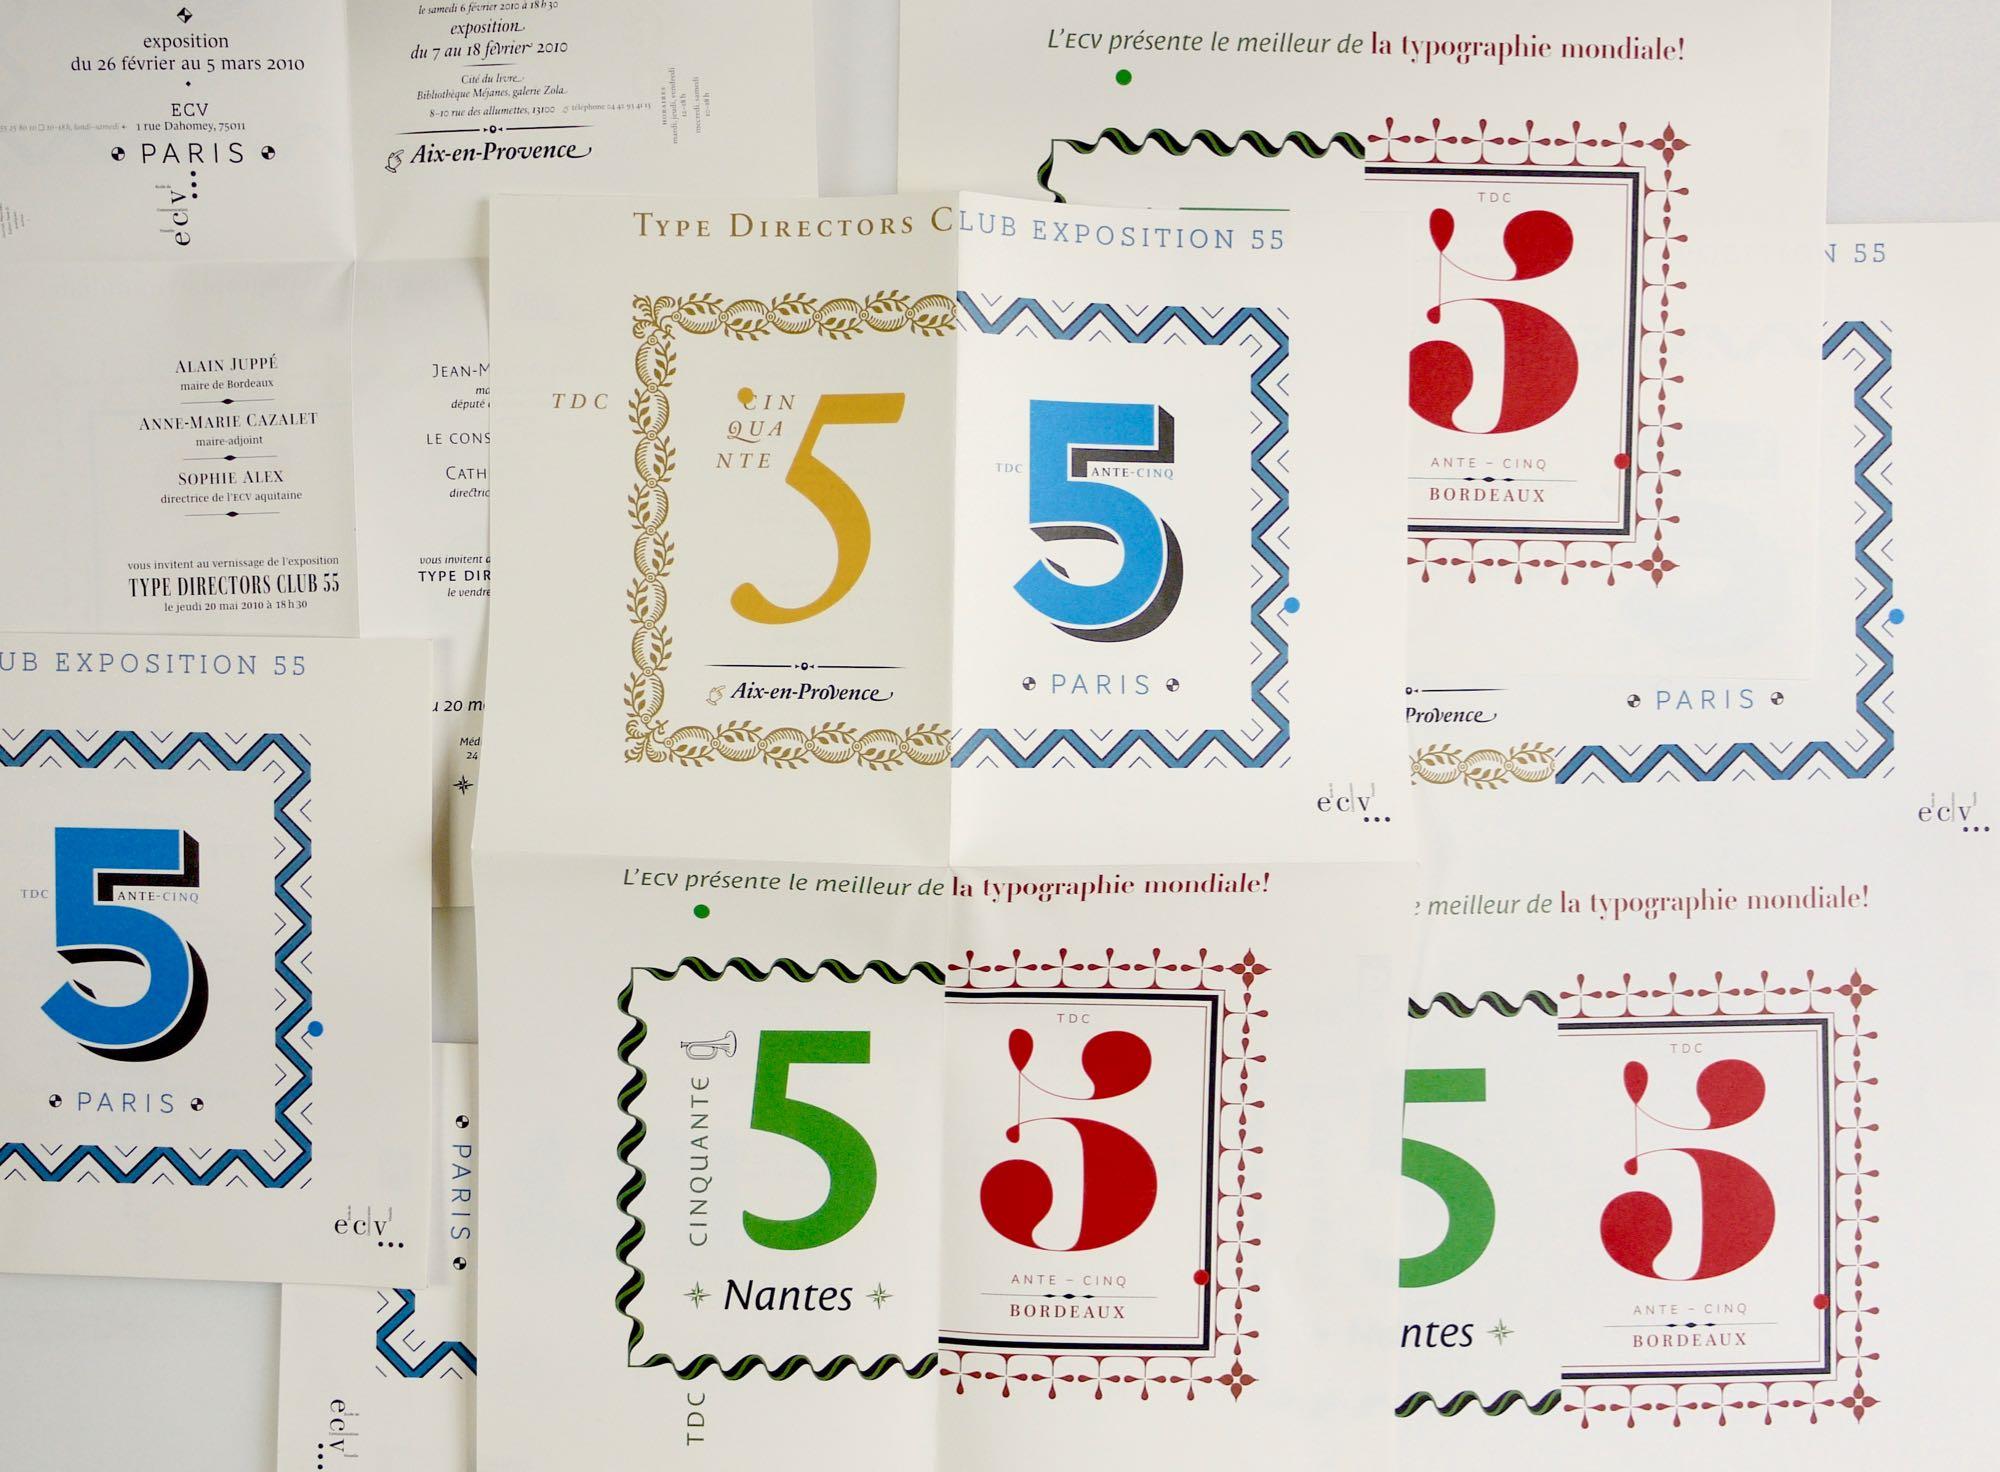 Type Directors Club 55